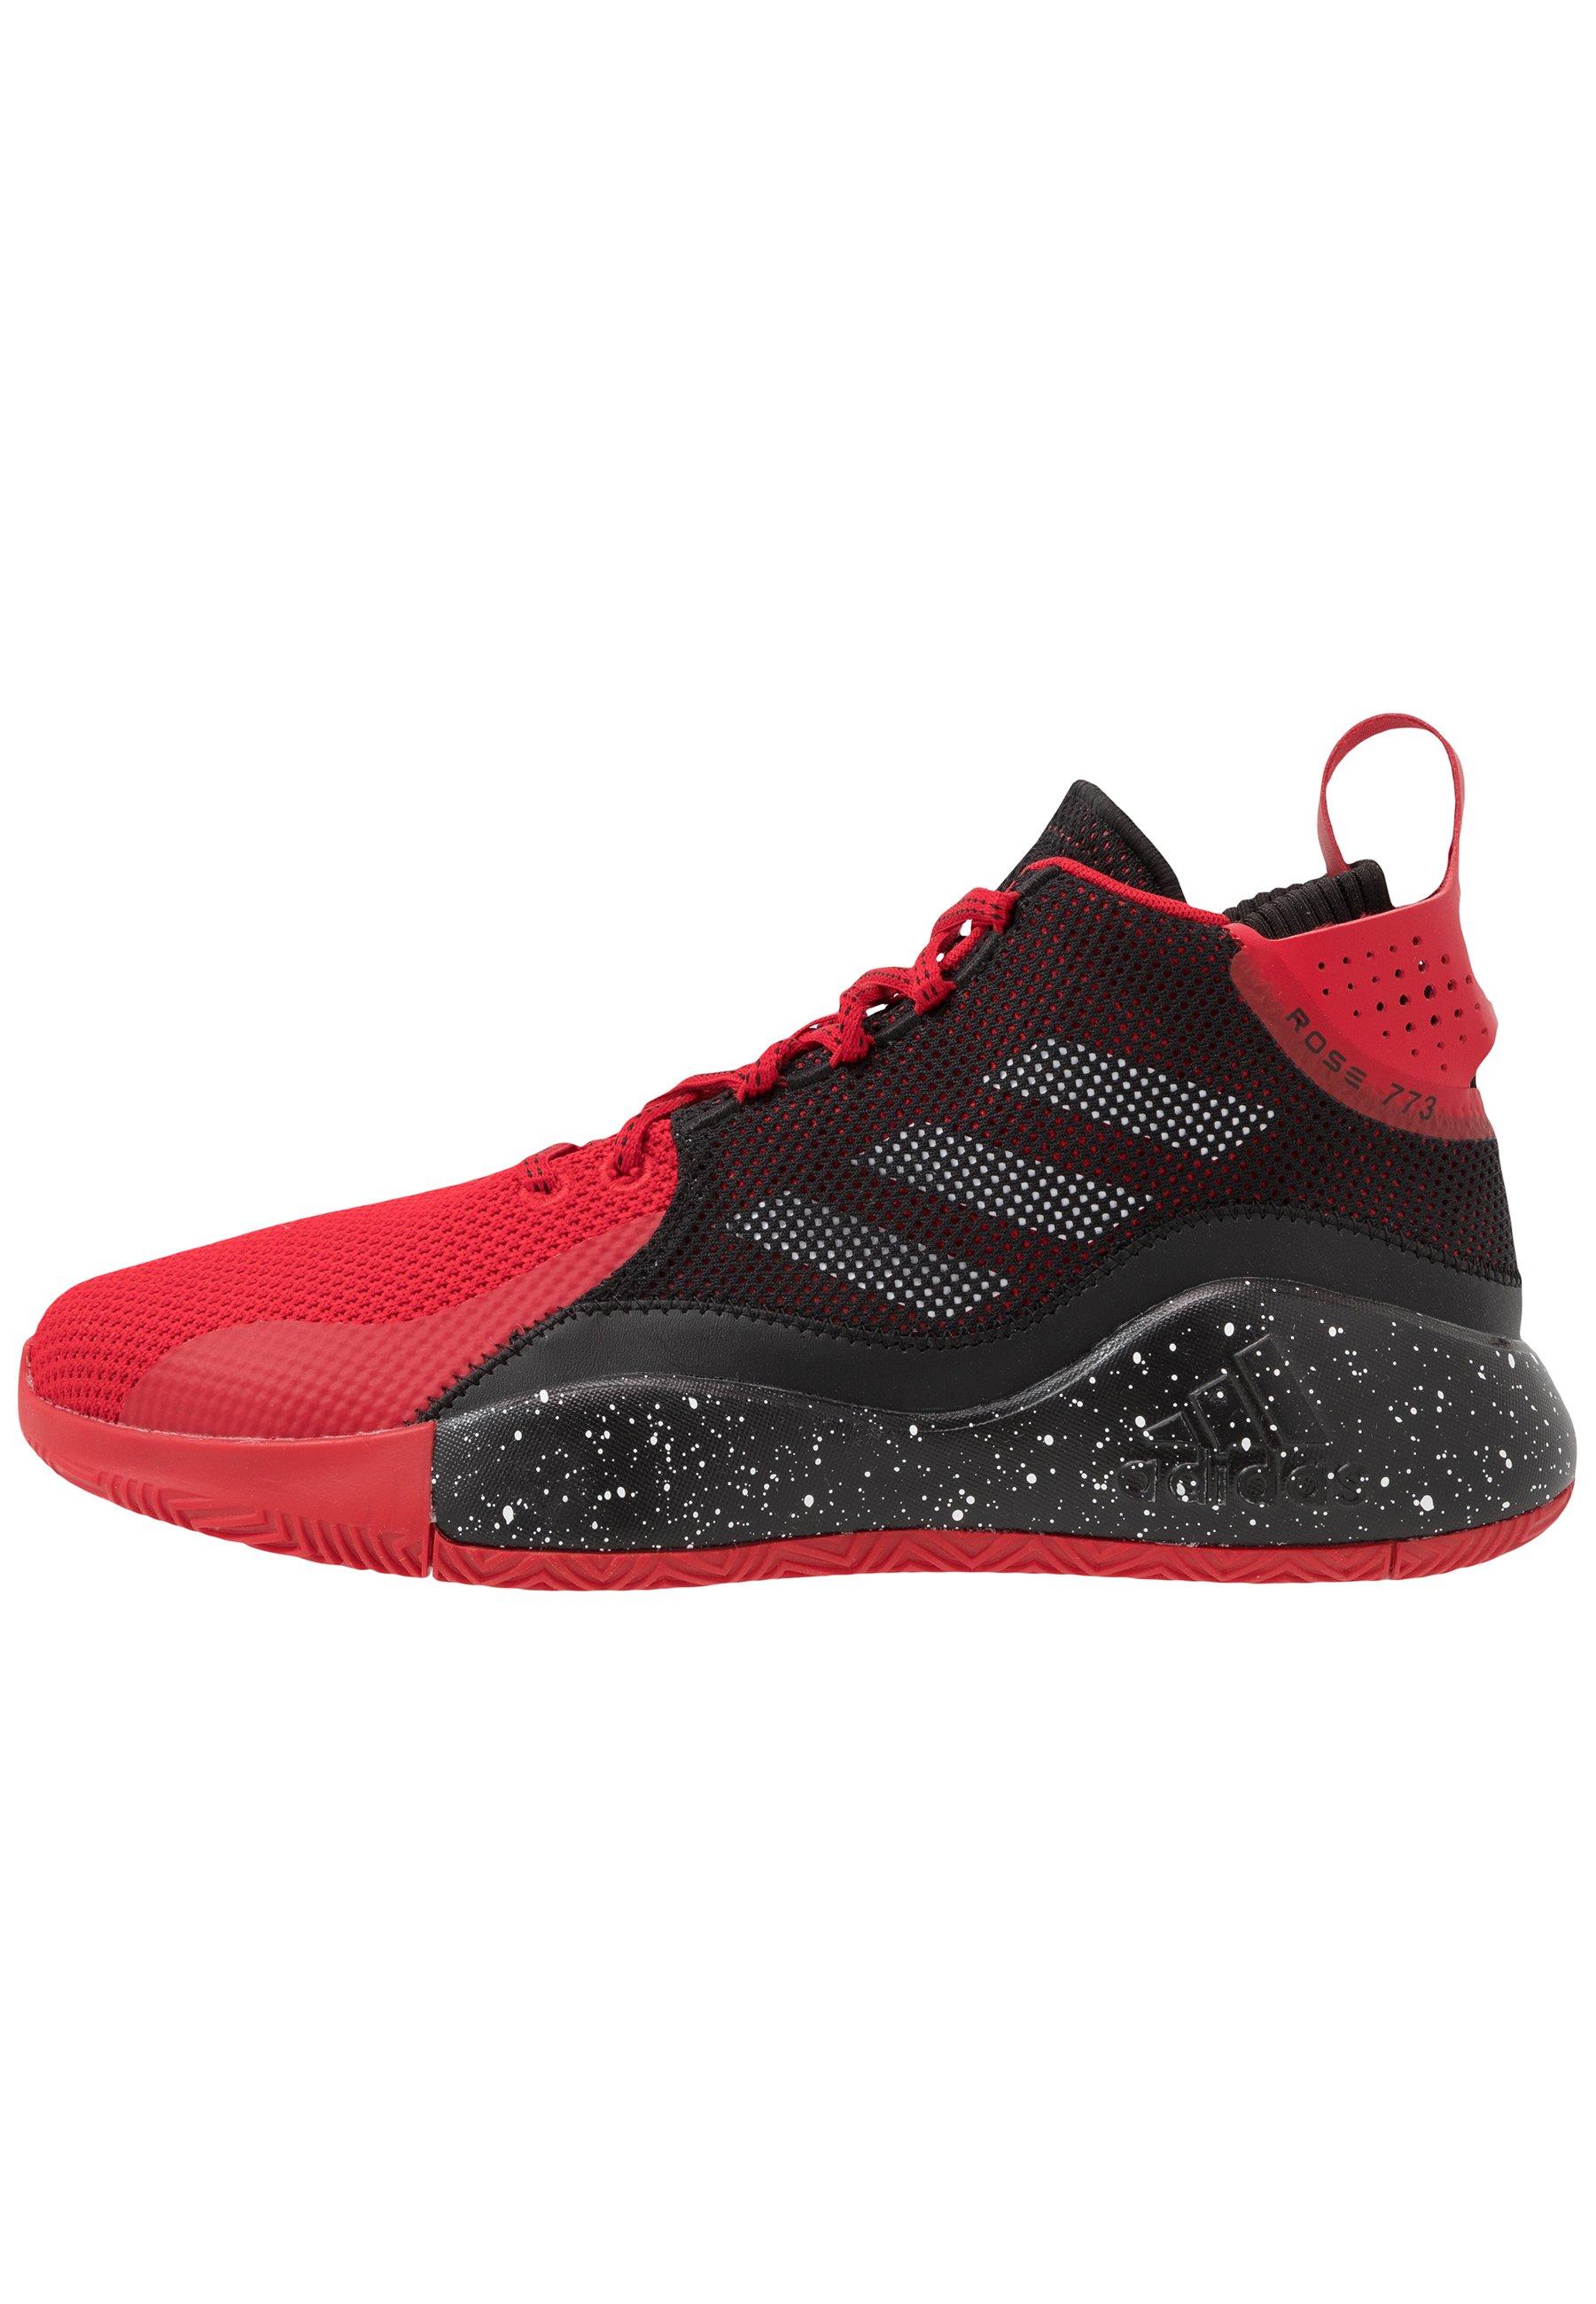 adidas rose chaussure